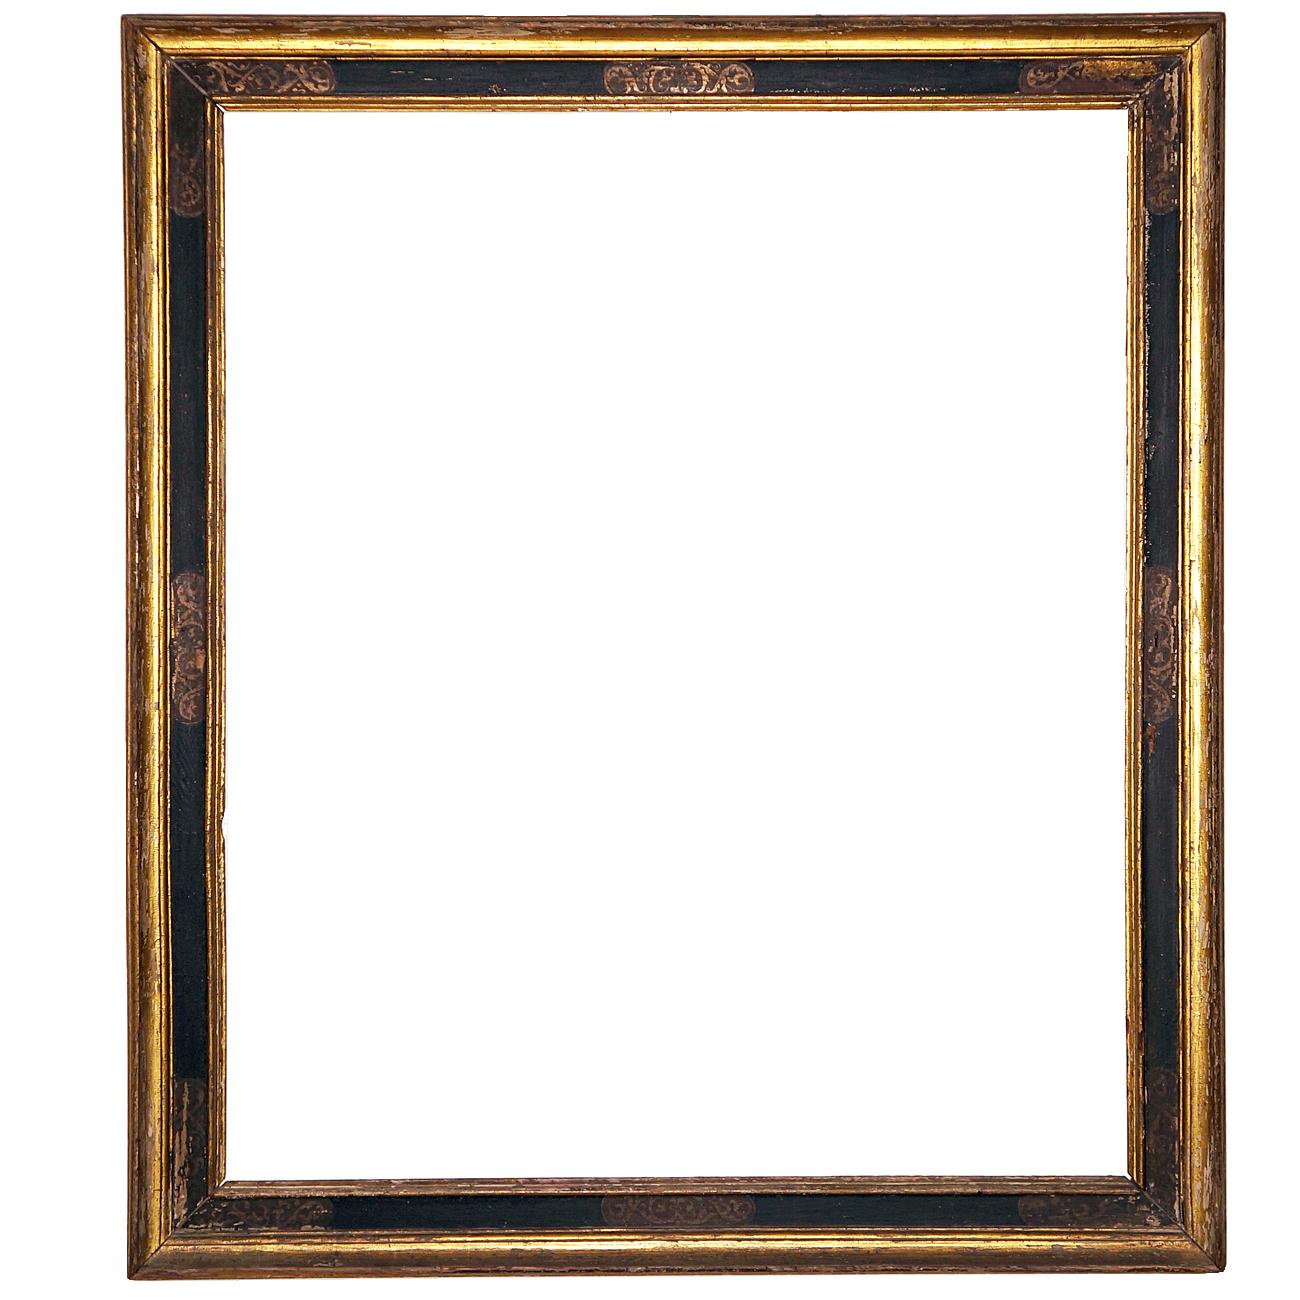 scraffito frame antike rahmen. Black Bedroom Furniture Sets. Home Design Ideas